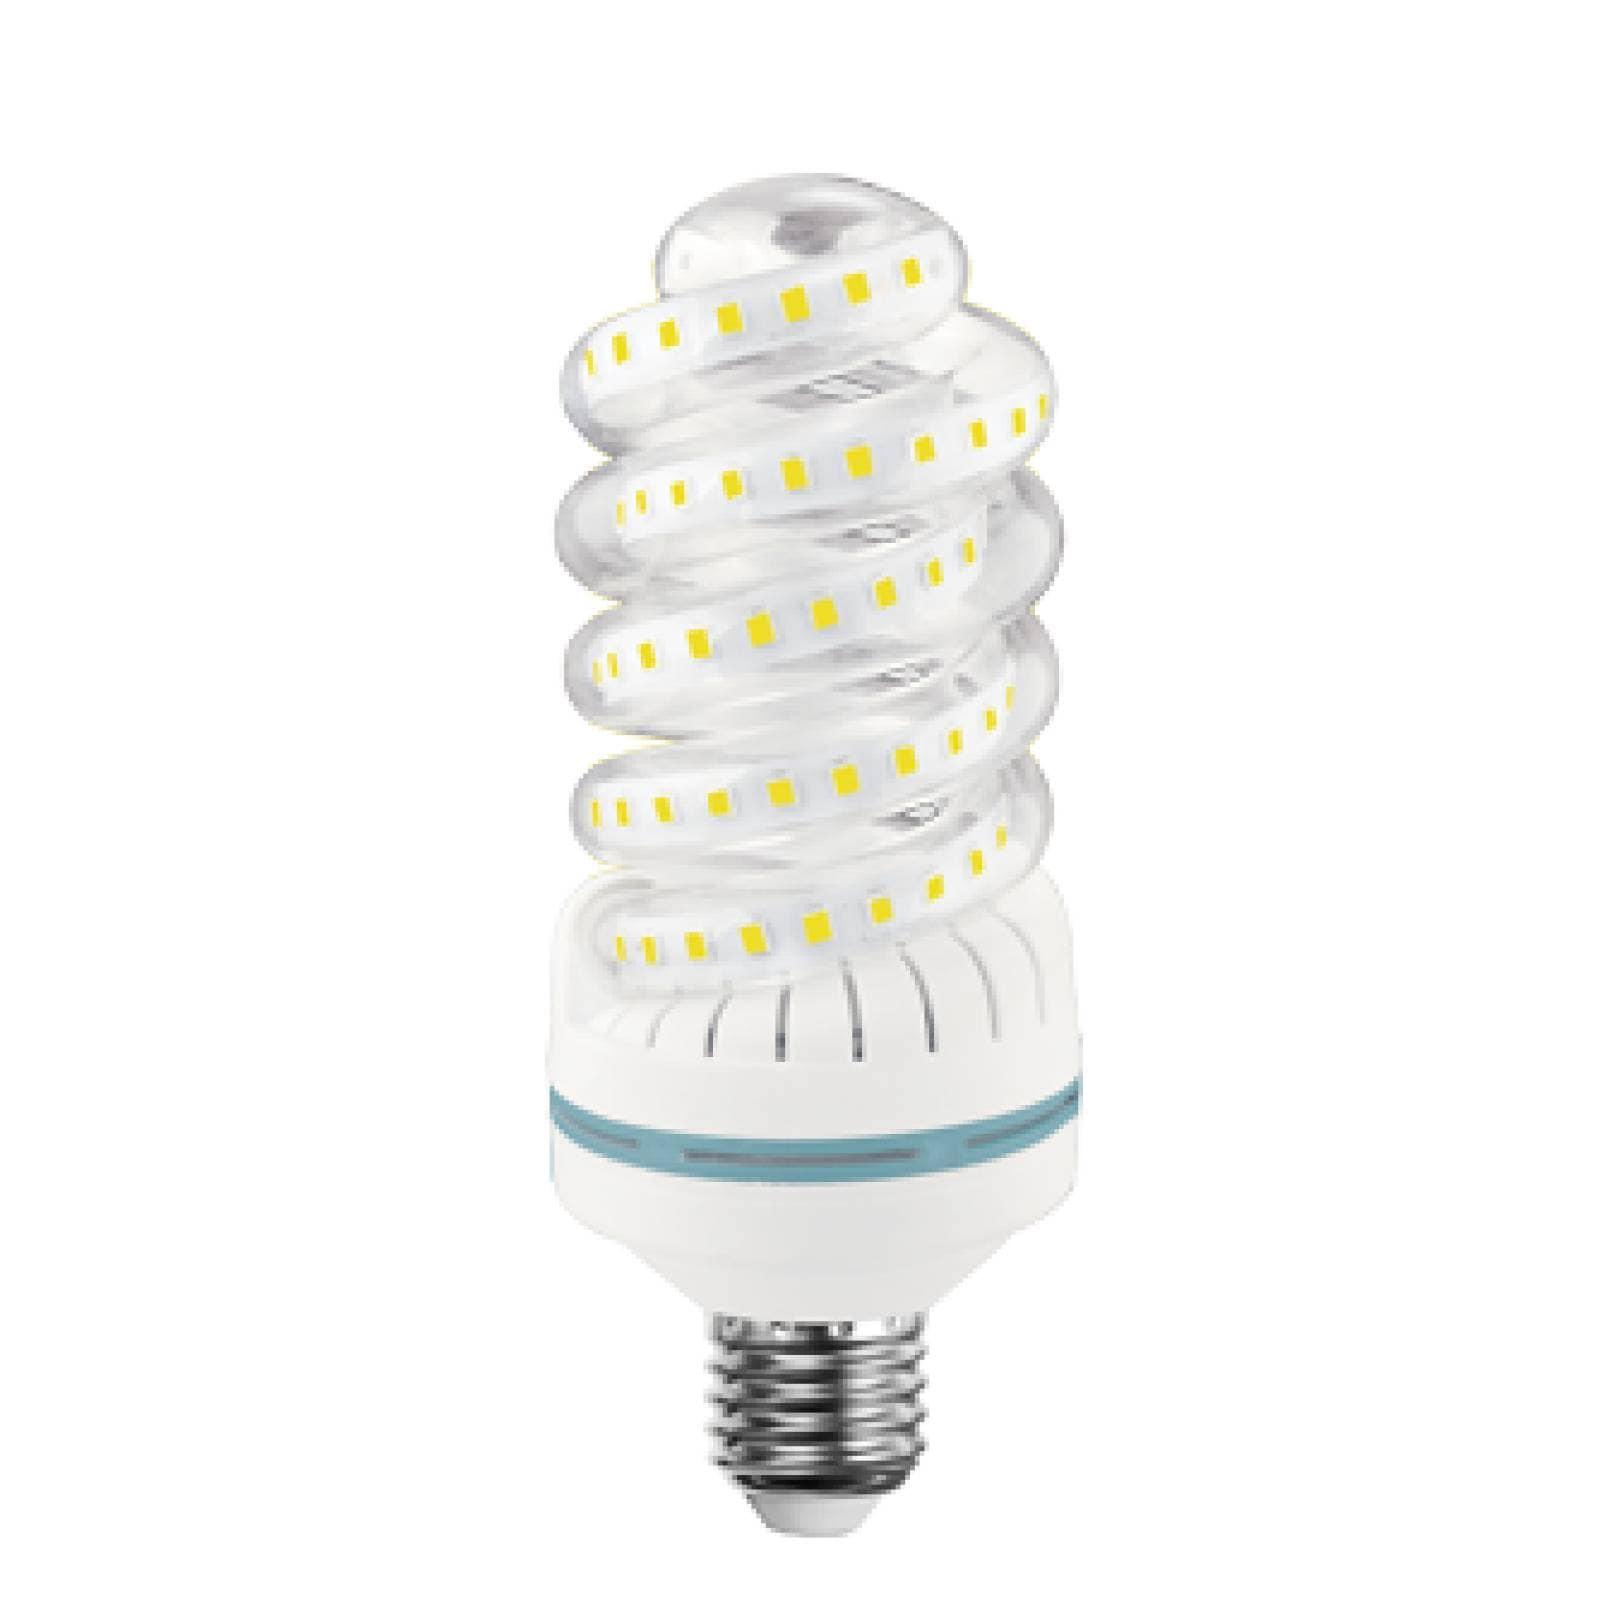 Foco Ahorrador LED Espiral 5366-B 20W Luz Blanca Adir